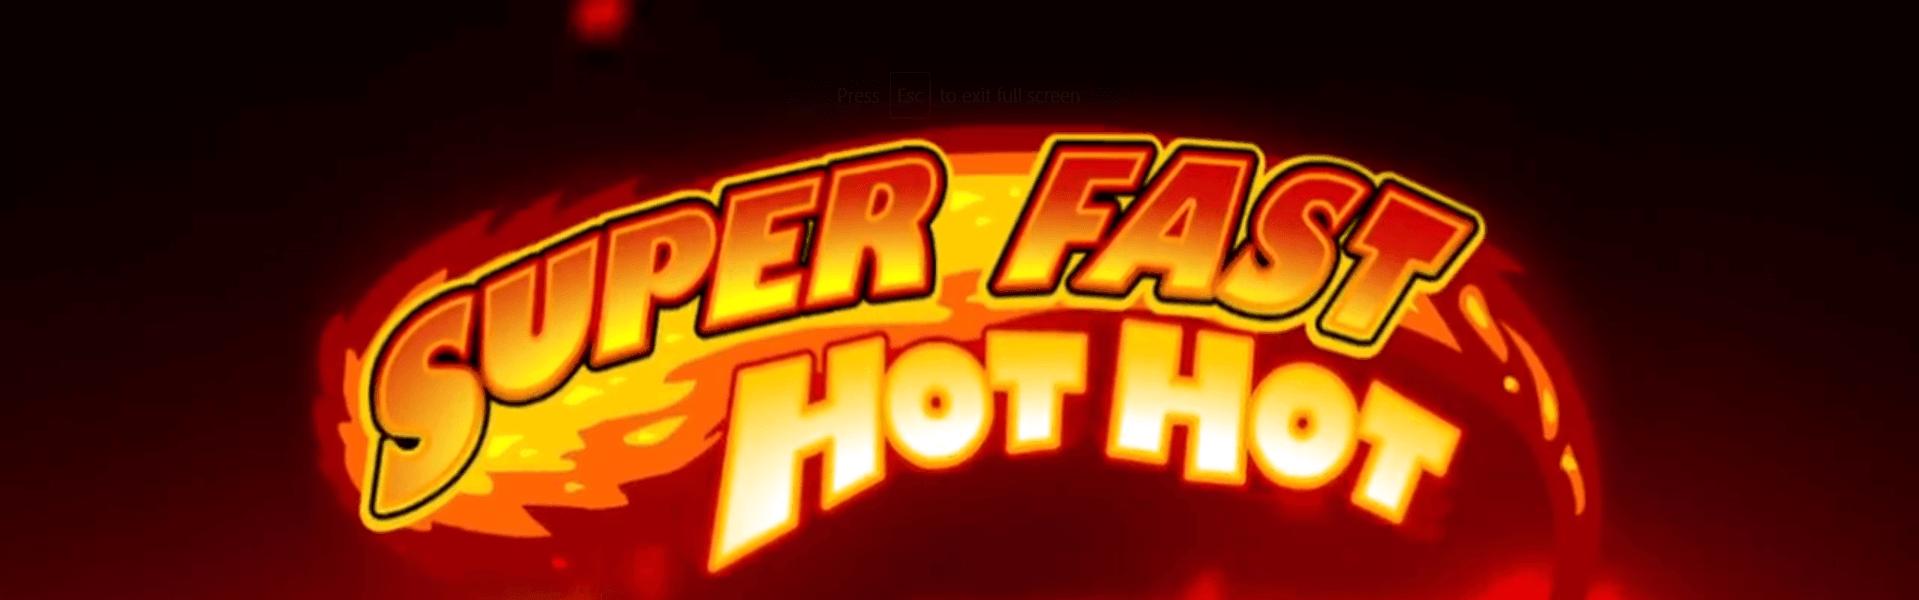 Super Fast Hot Hot slot